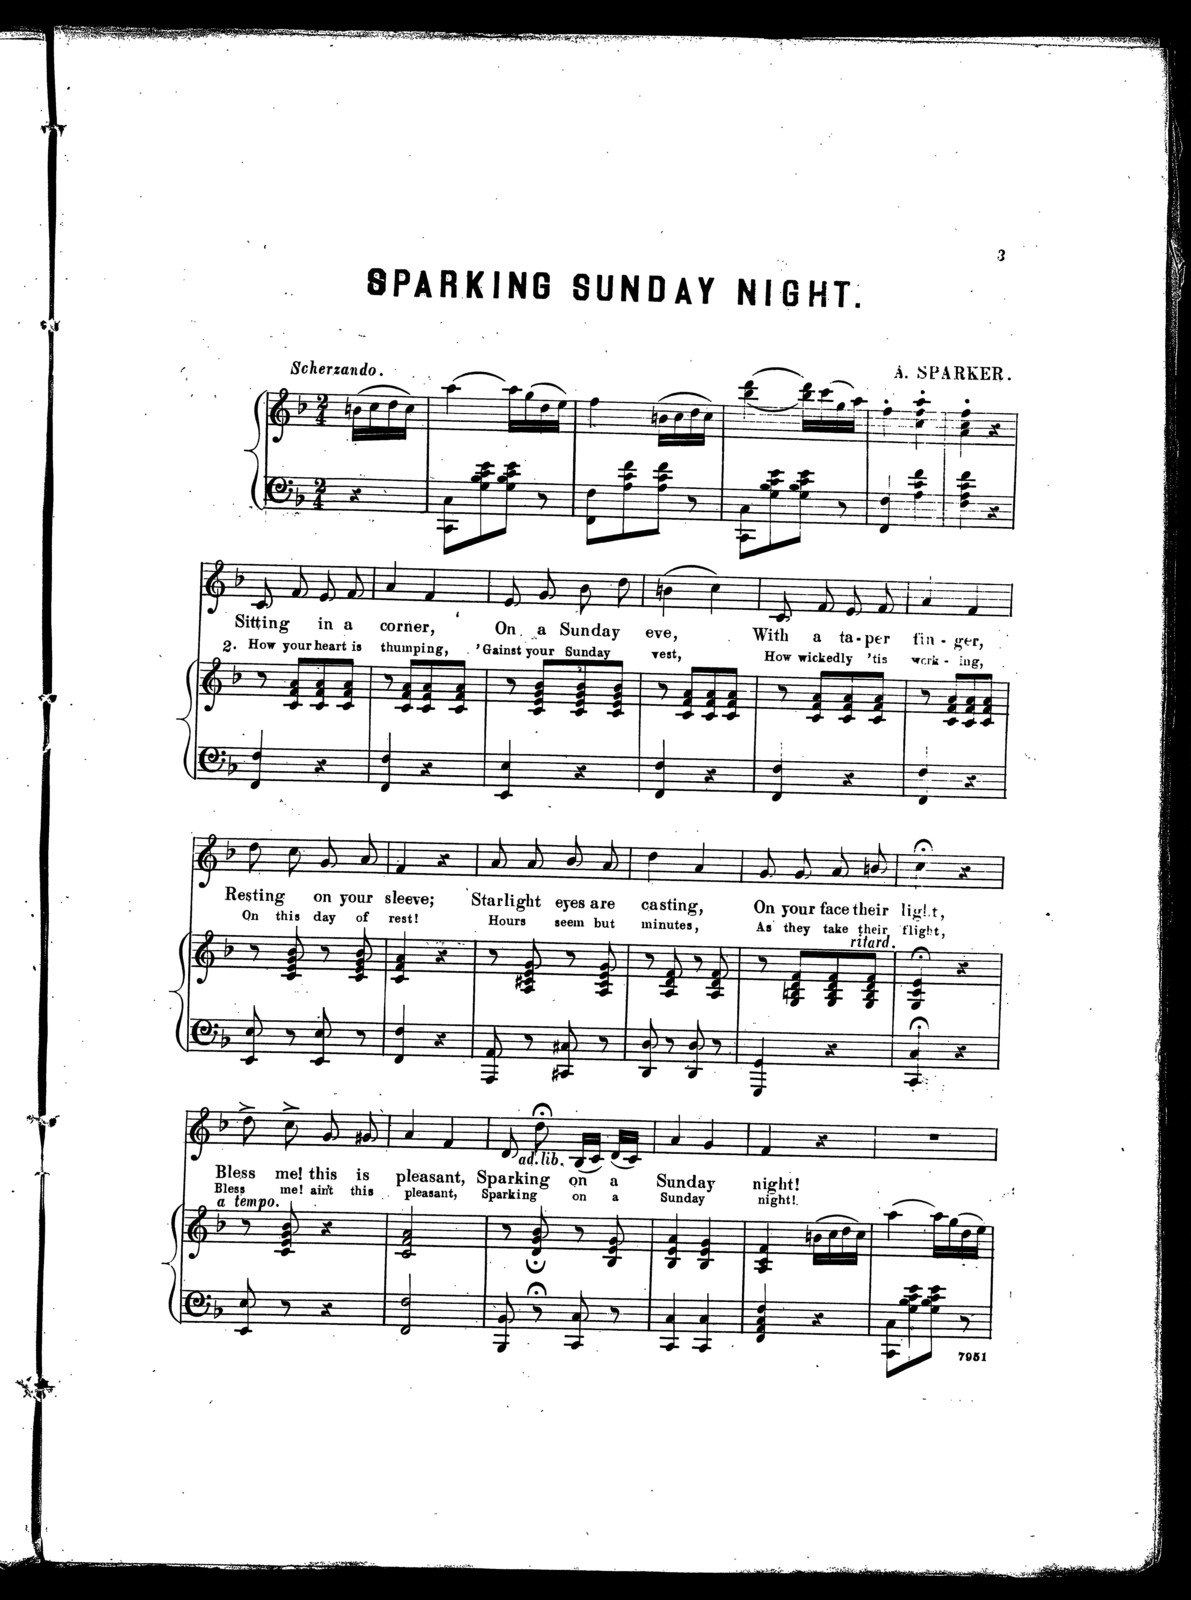 Sparking Sunday night